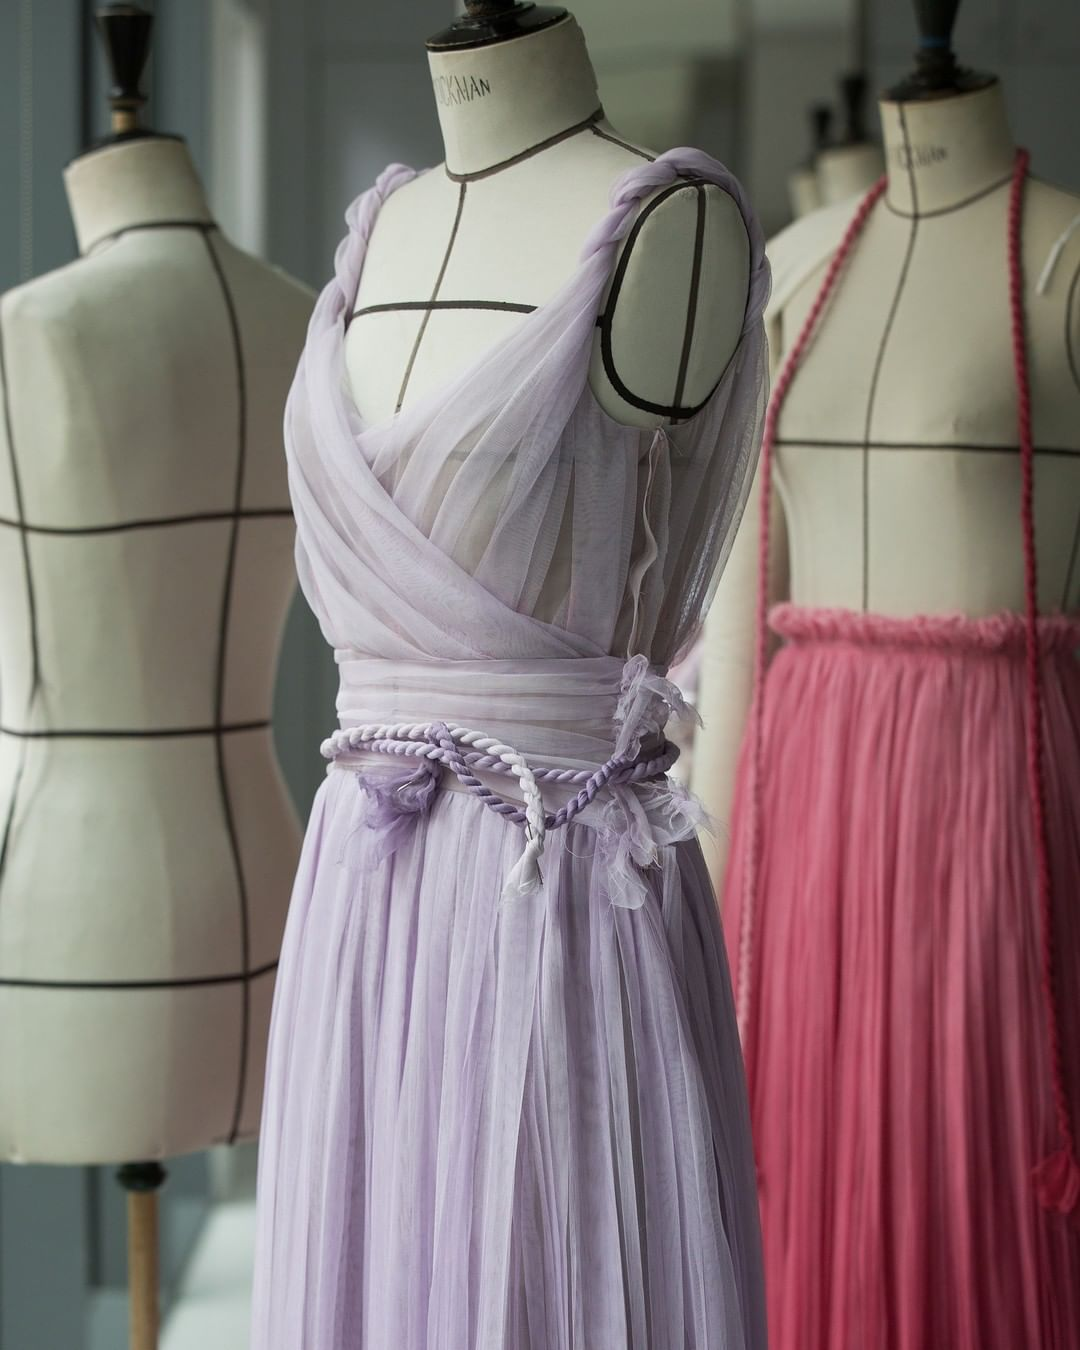 Gowns. Source: Instagram - Dior